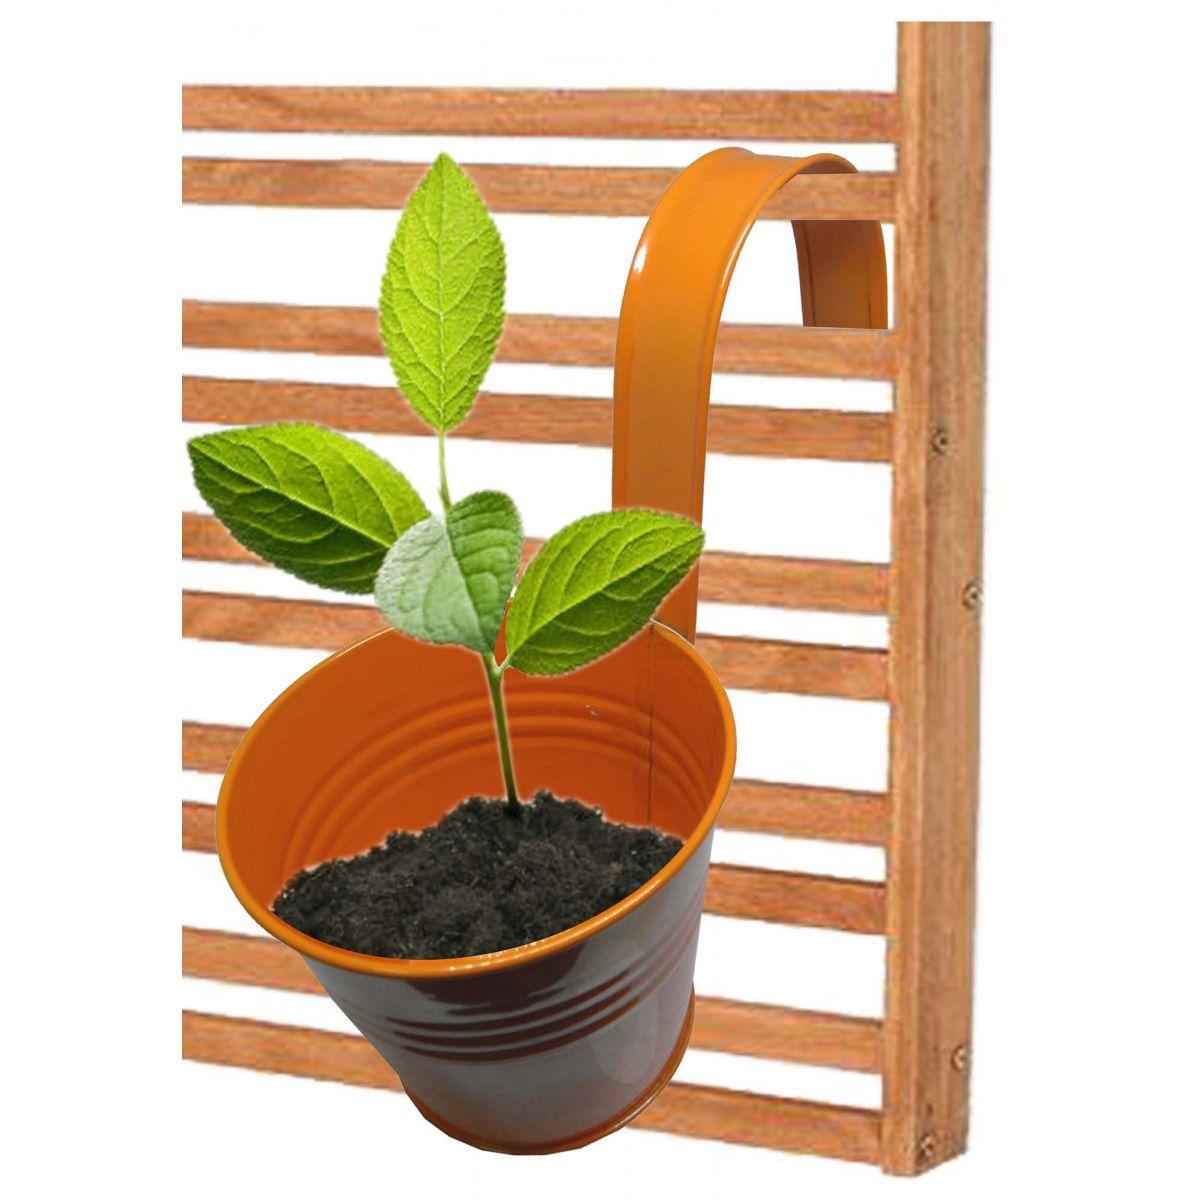 Kit 4 Unid Cachepot De Metal Para Jardim Vertical Suspenso Planta Flor Abobora (CACHEPO-1)